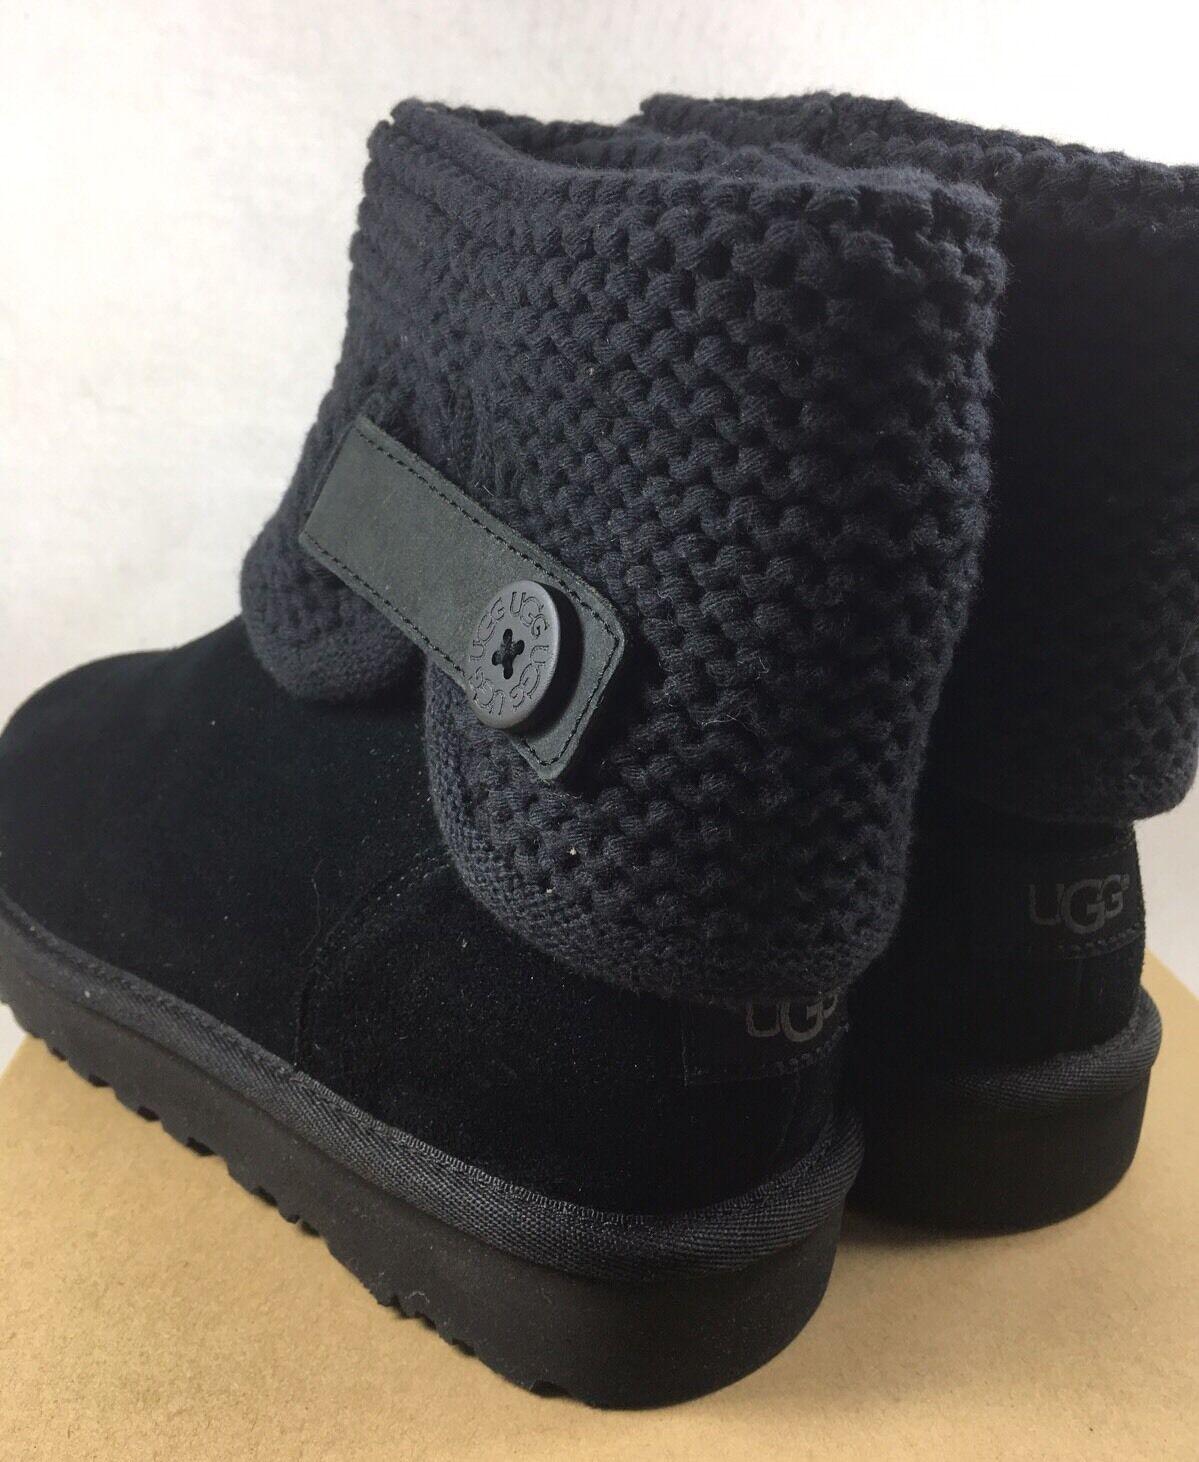 b8916bb1810 UGG Australia Women's Shaina Black Knit Boots NEW 1012534 Cuff Ankle Bootie